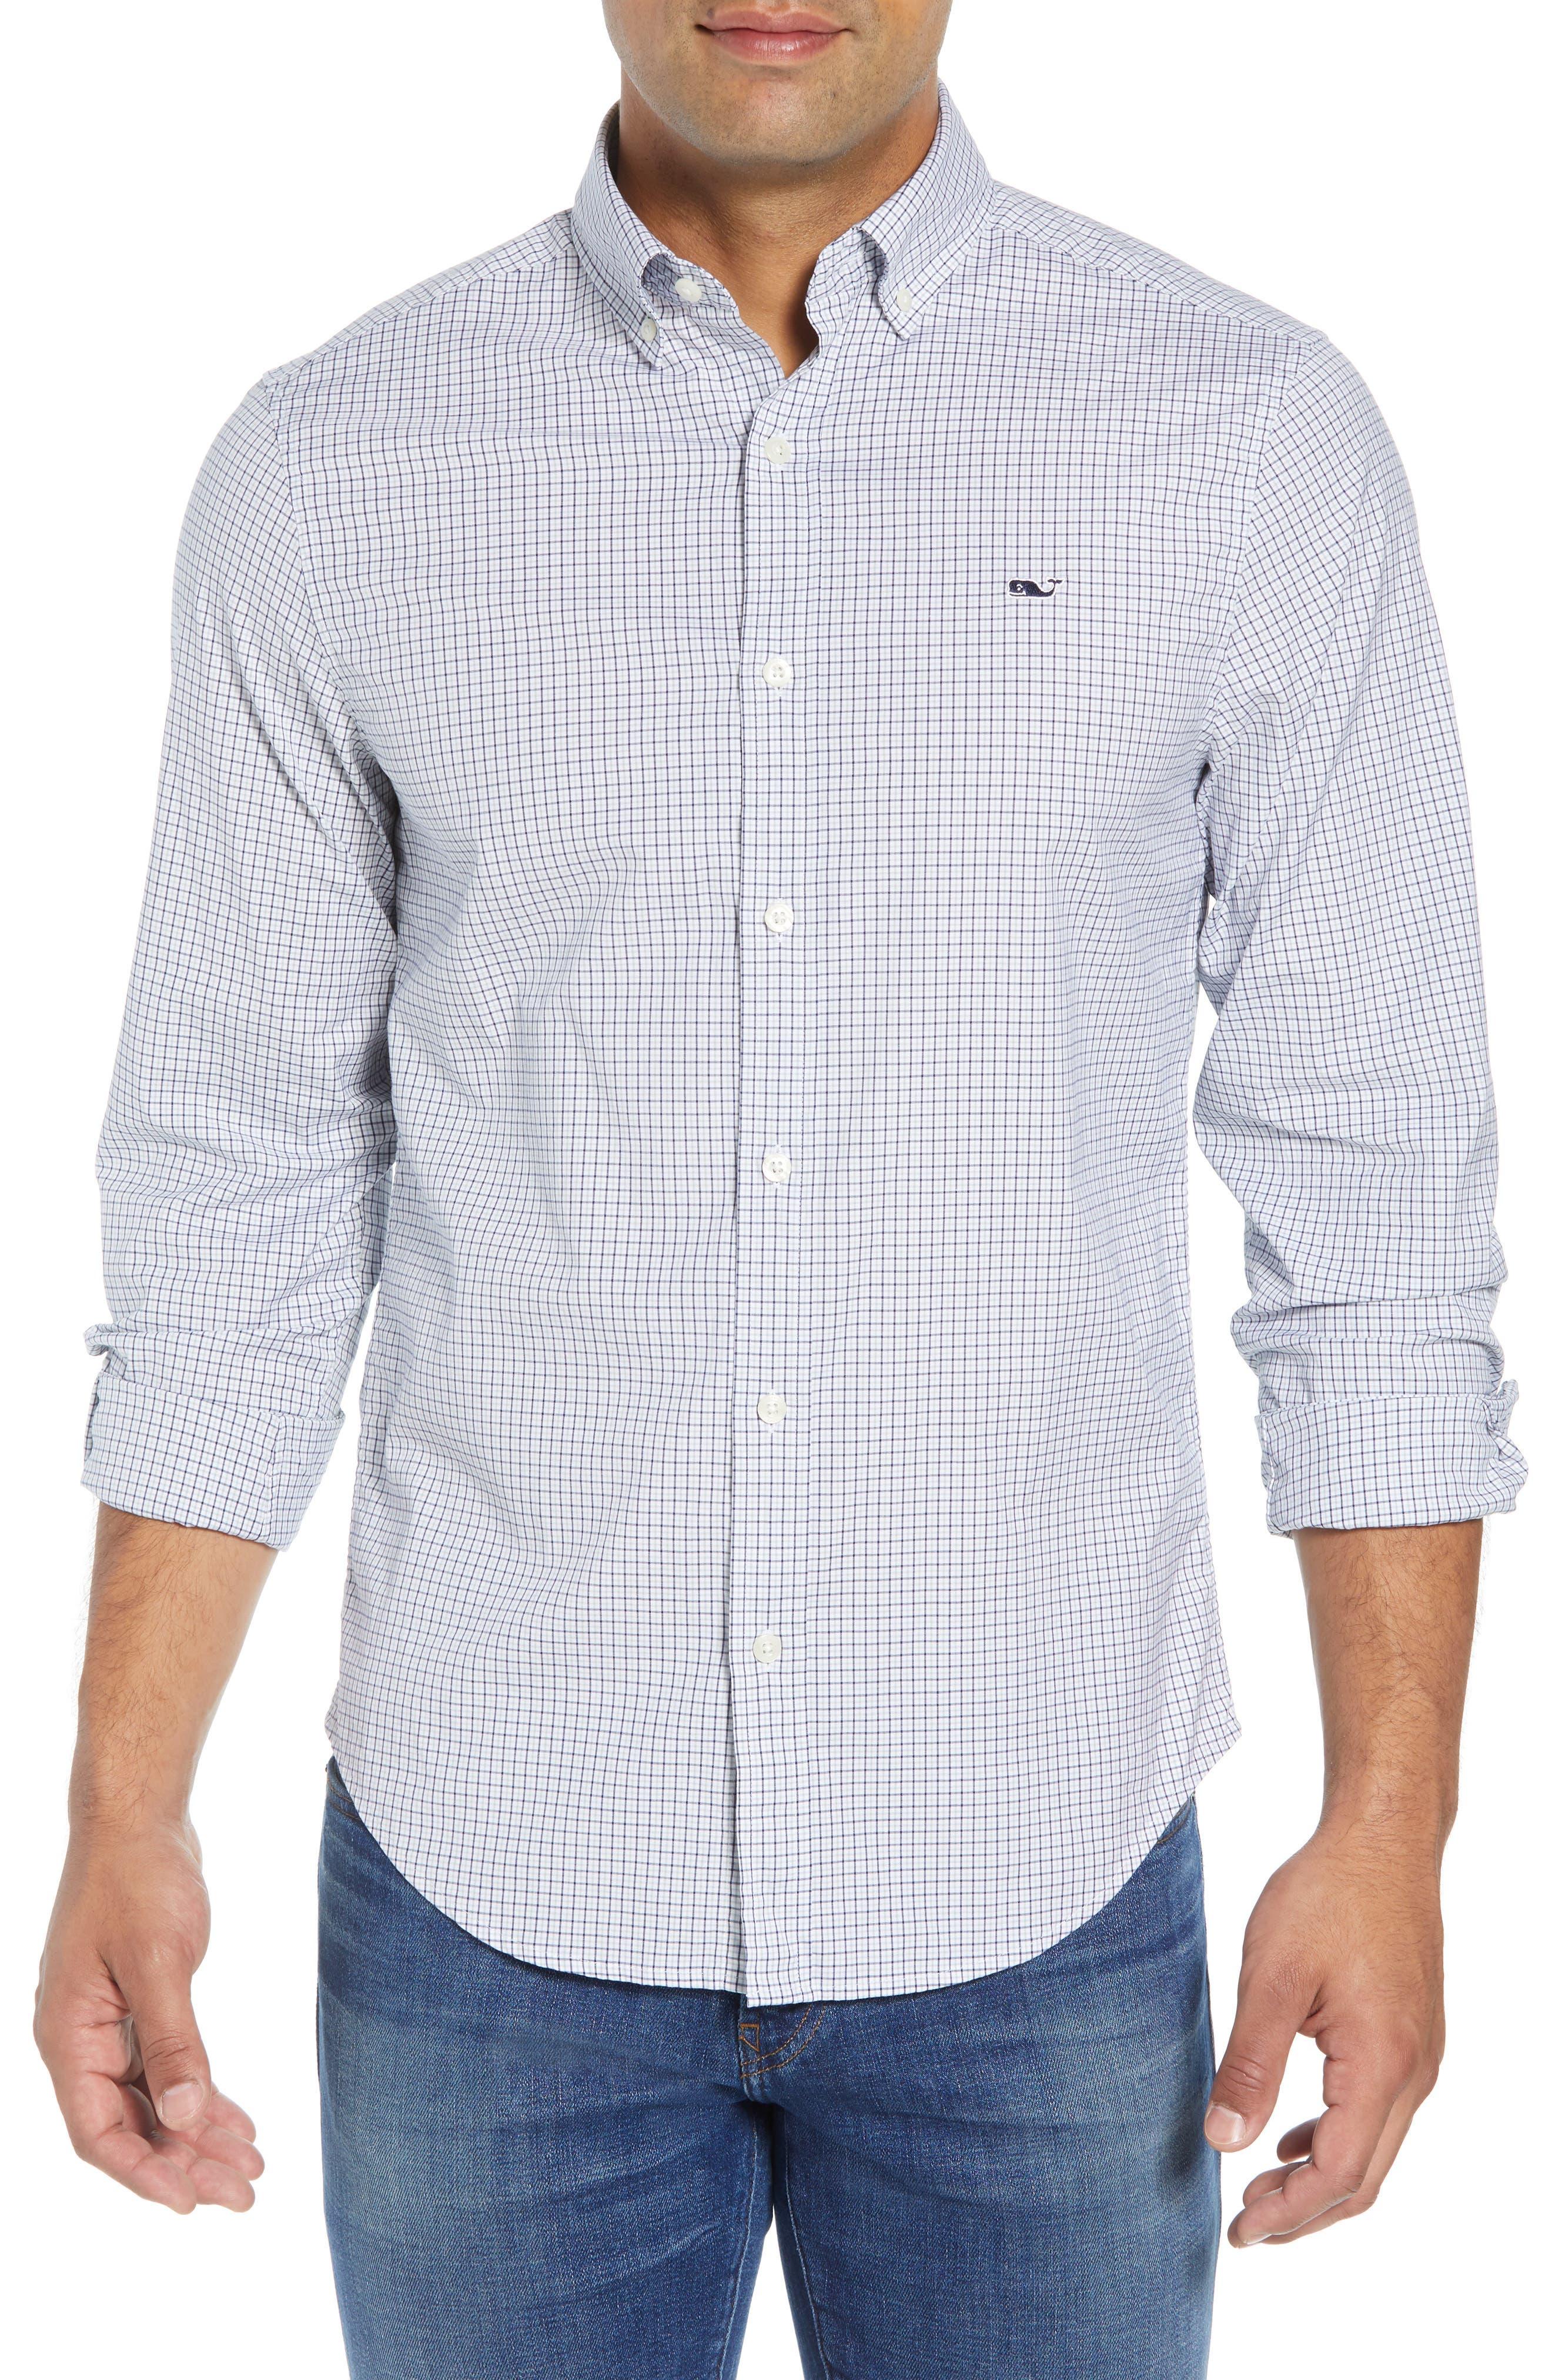 Beechcroft Regular Fit Check Sport Shirt,                             Main thumbnail 1, color,                             034